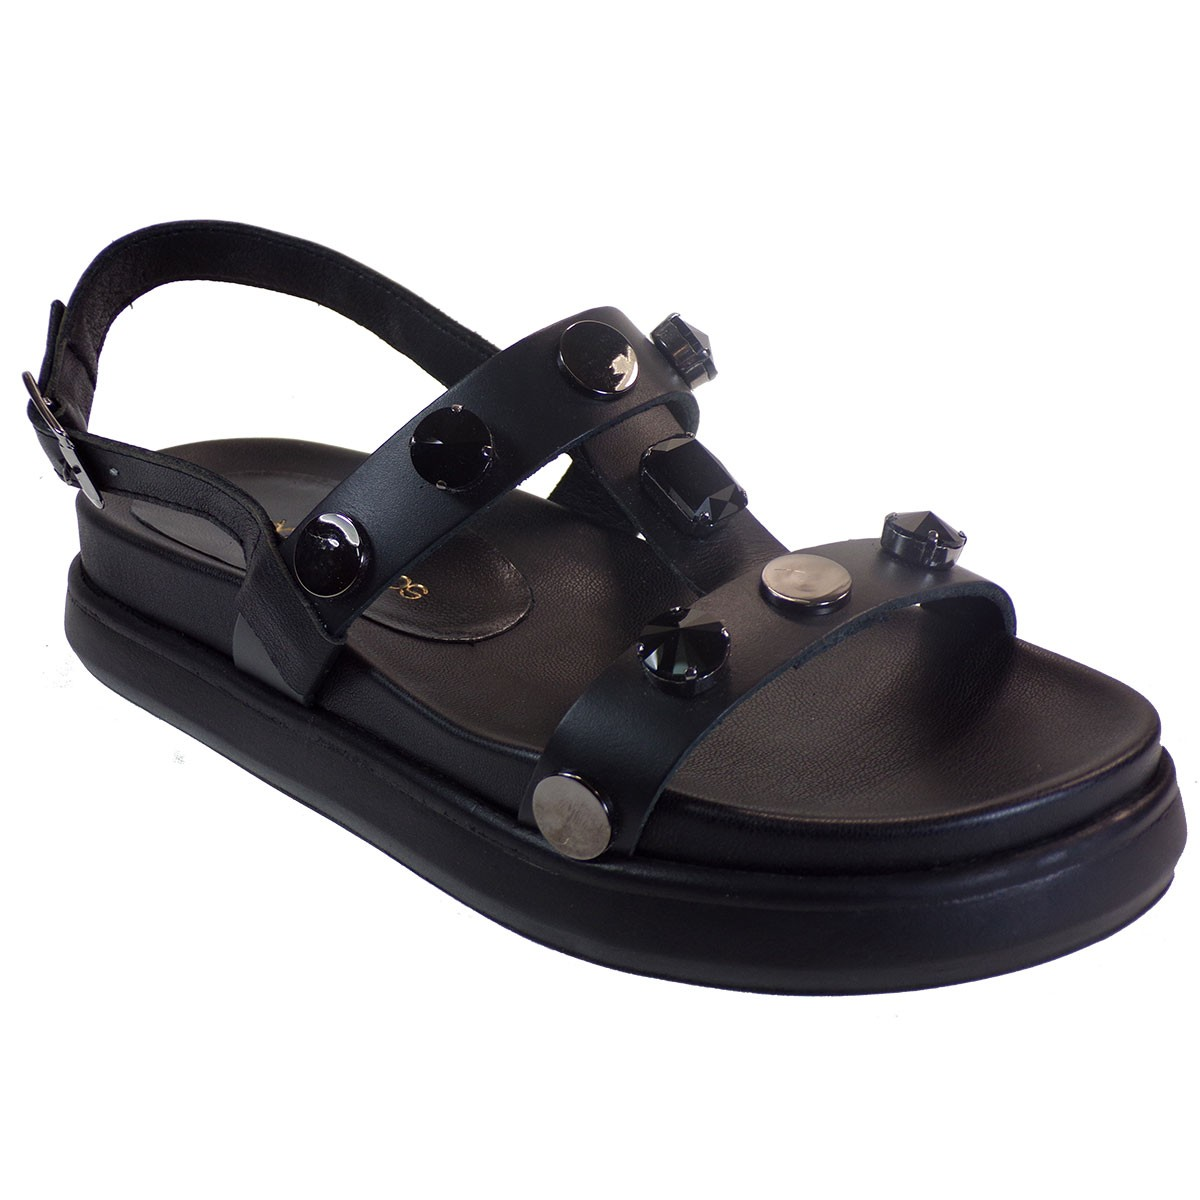 Xaris Kazakos Γυναικεία Παπούτσια Πέδιλα 3512 Μαύρο Δέρμα